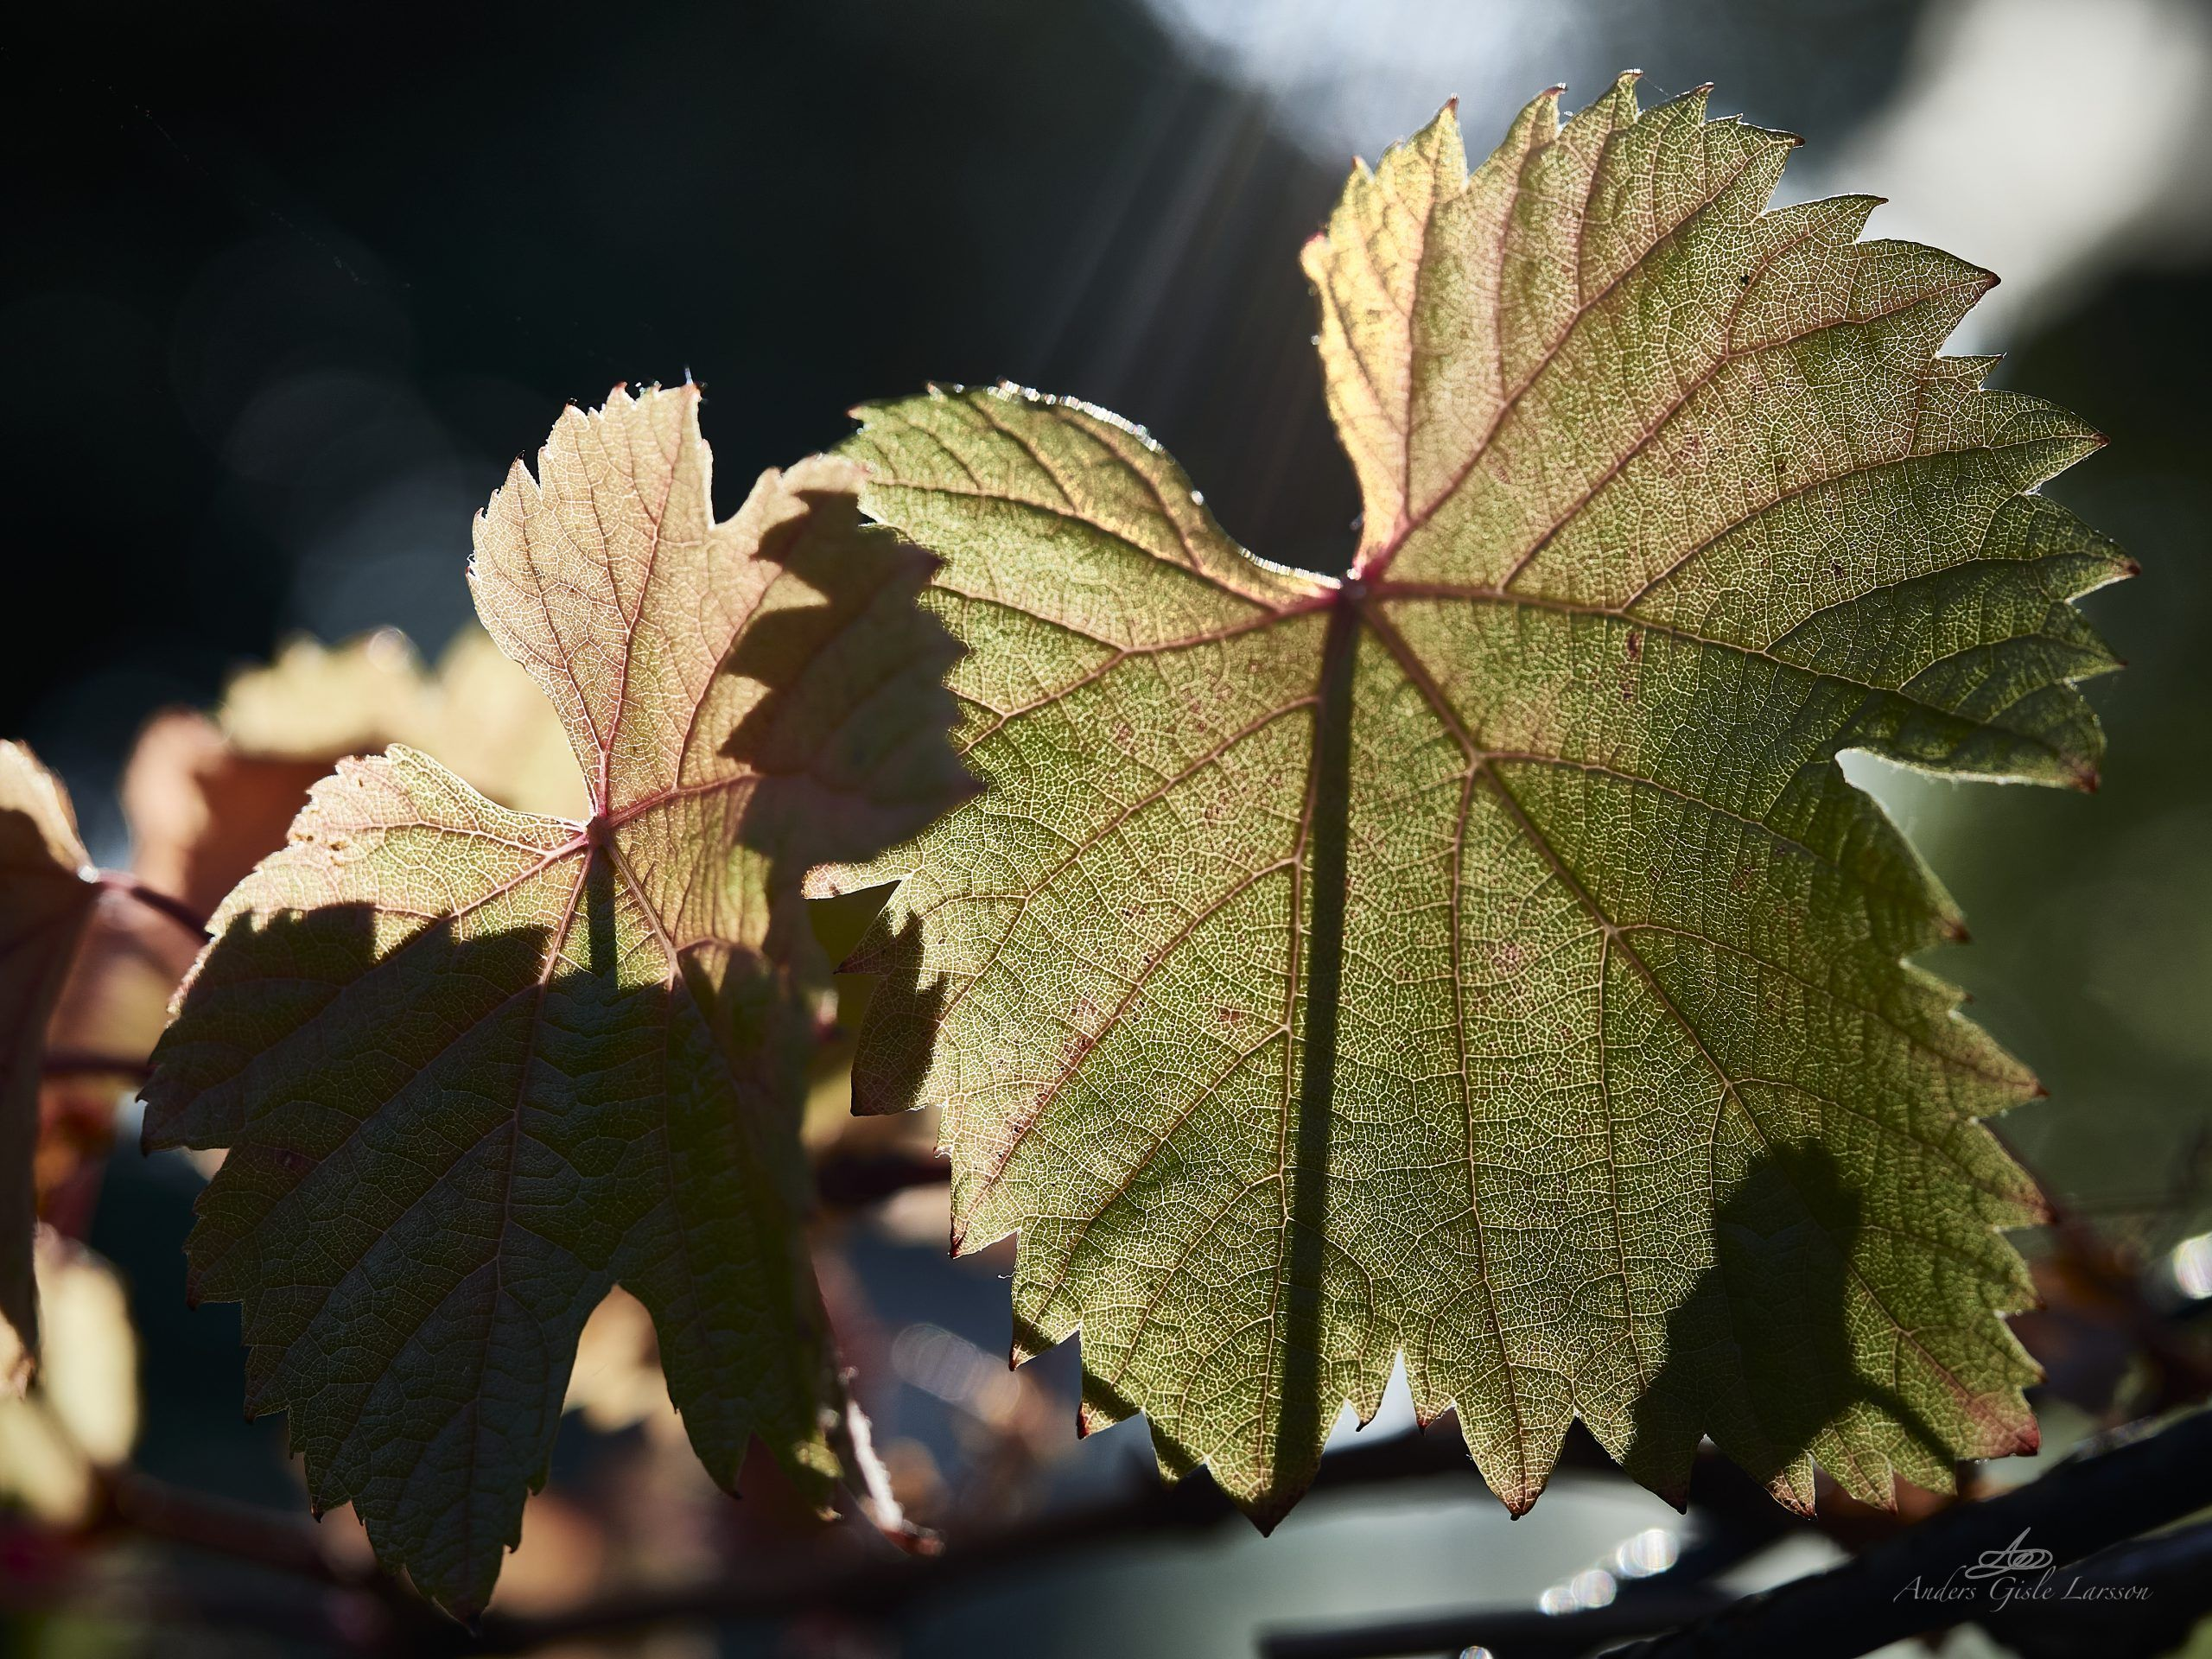 Sol vin